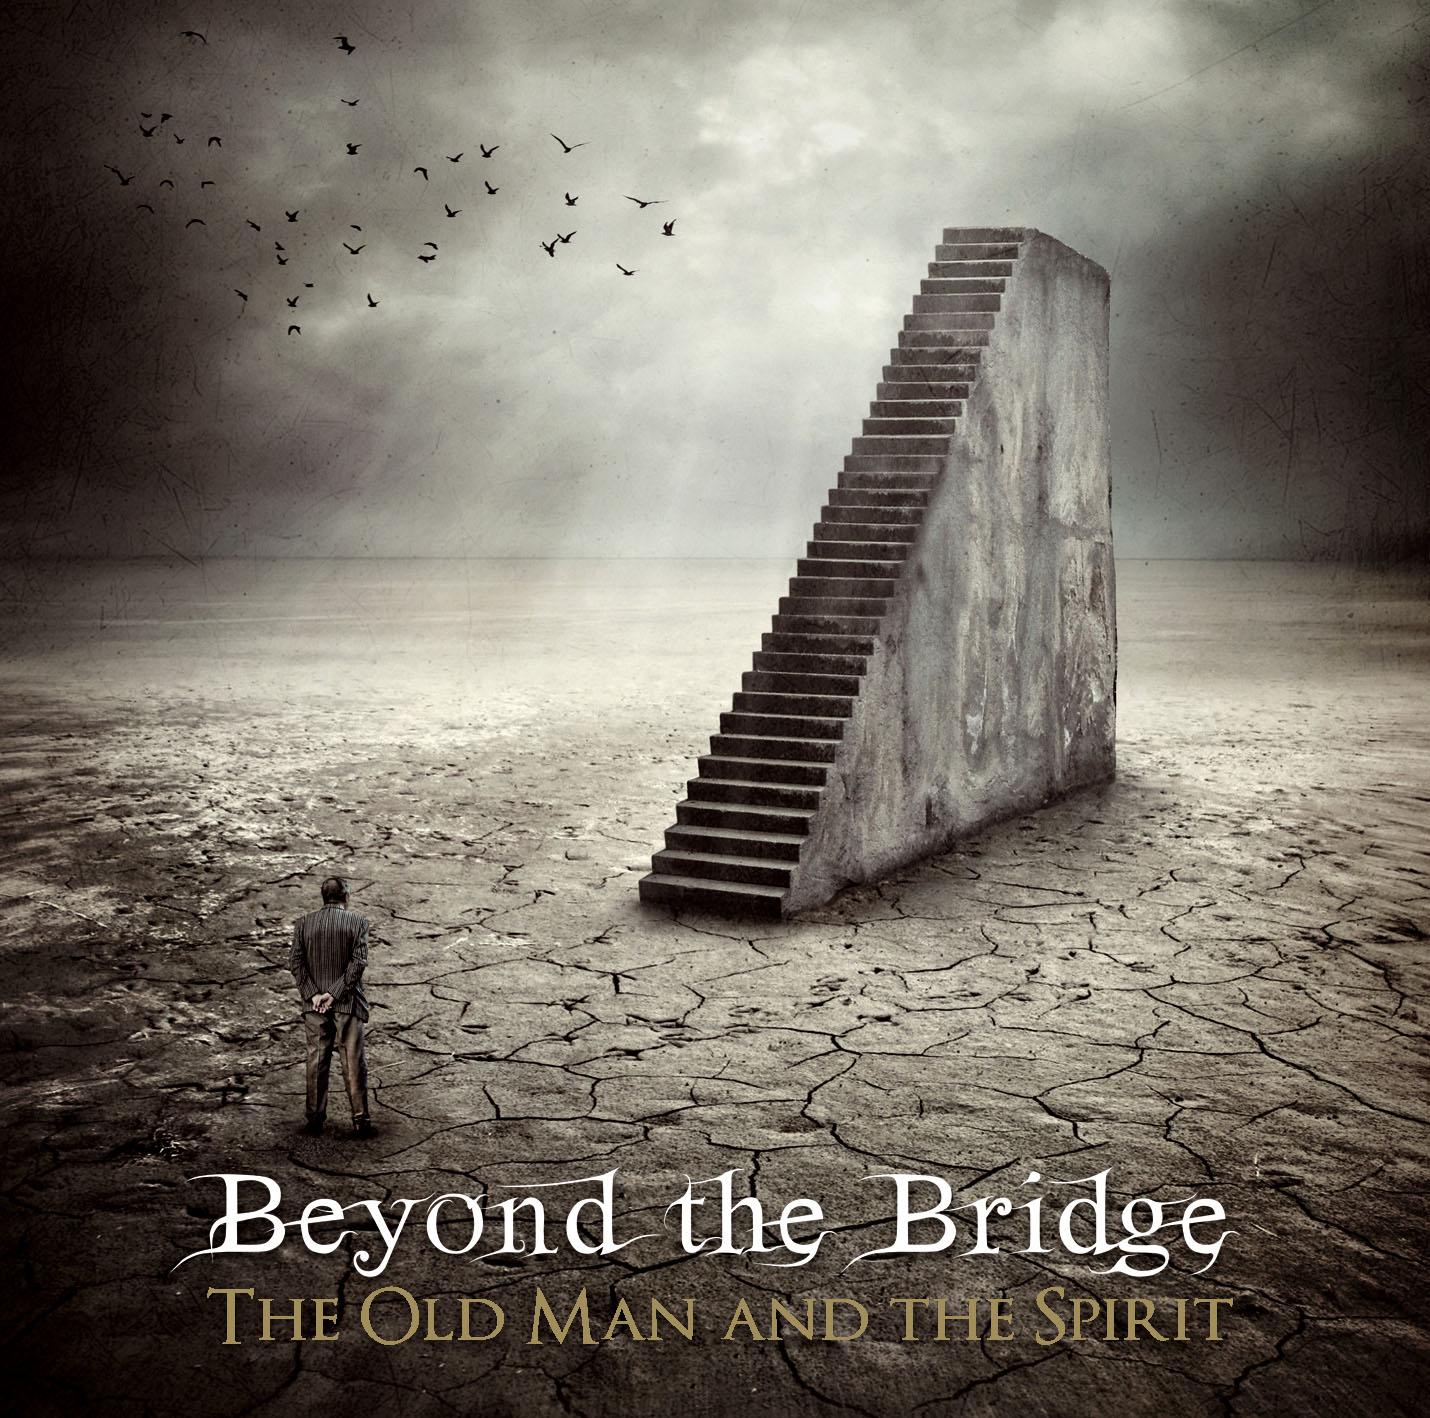 Beyond+The+Bridge-The+Old+Man+%26+The+Spirit.jpg (1430×1418)